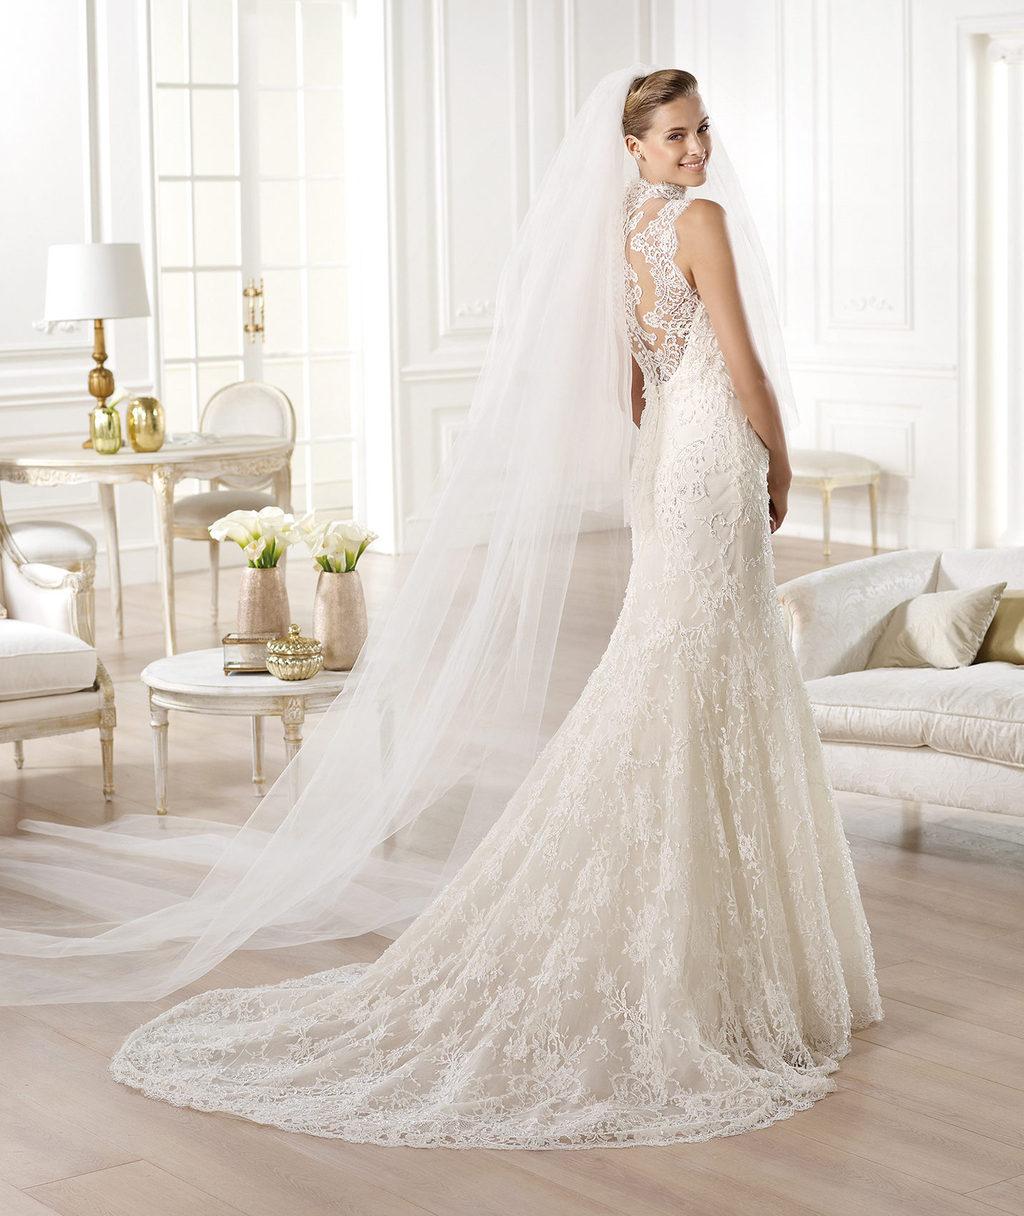 Yedira-wedding-dress-from-pronovias-atelier-2014-bridal.full